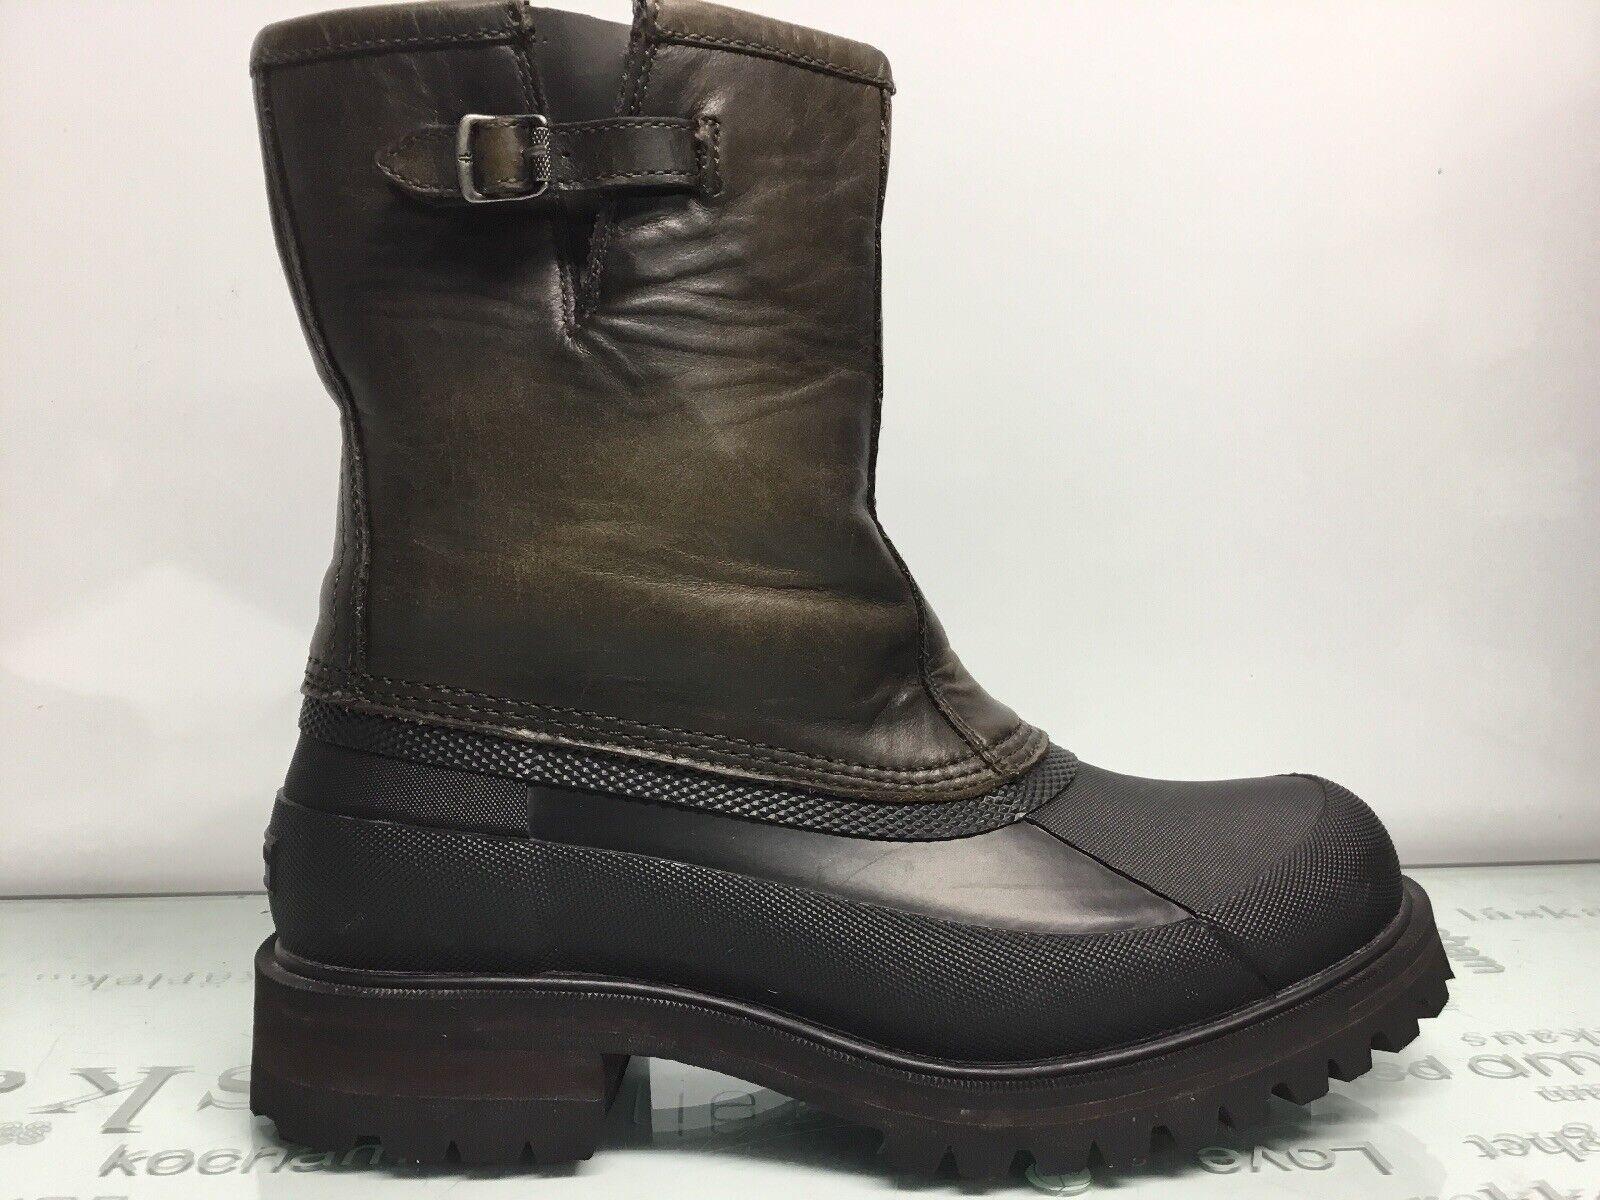 Frye Alaska tirar para hombre 3486162-STC Piedra Cuero Impermeable botas